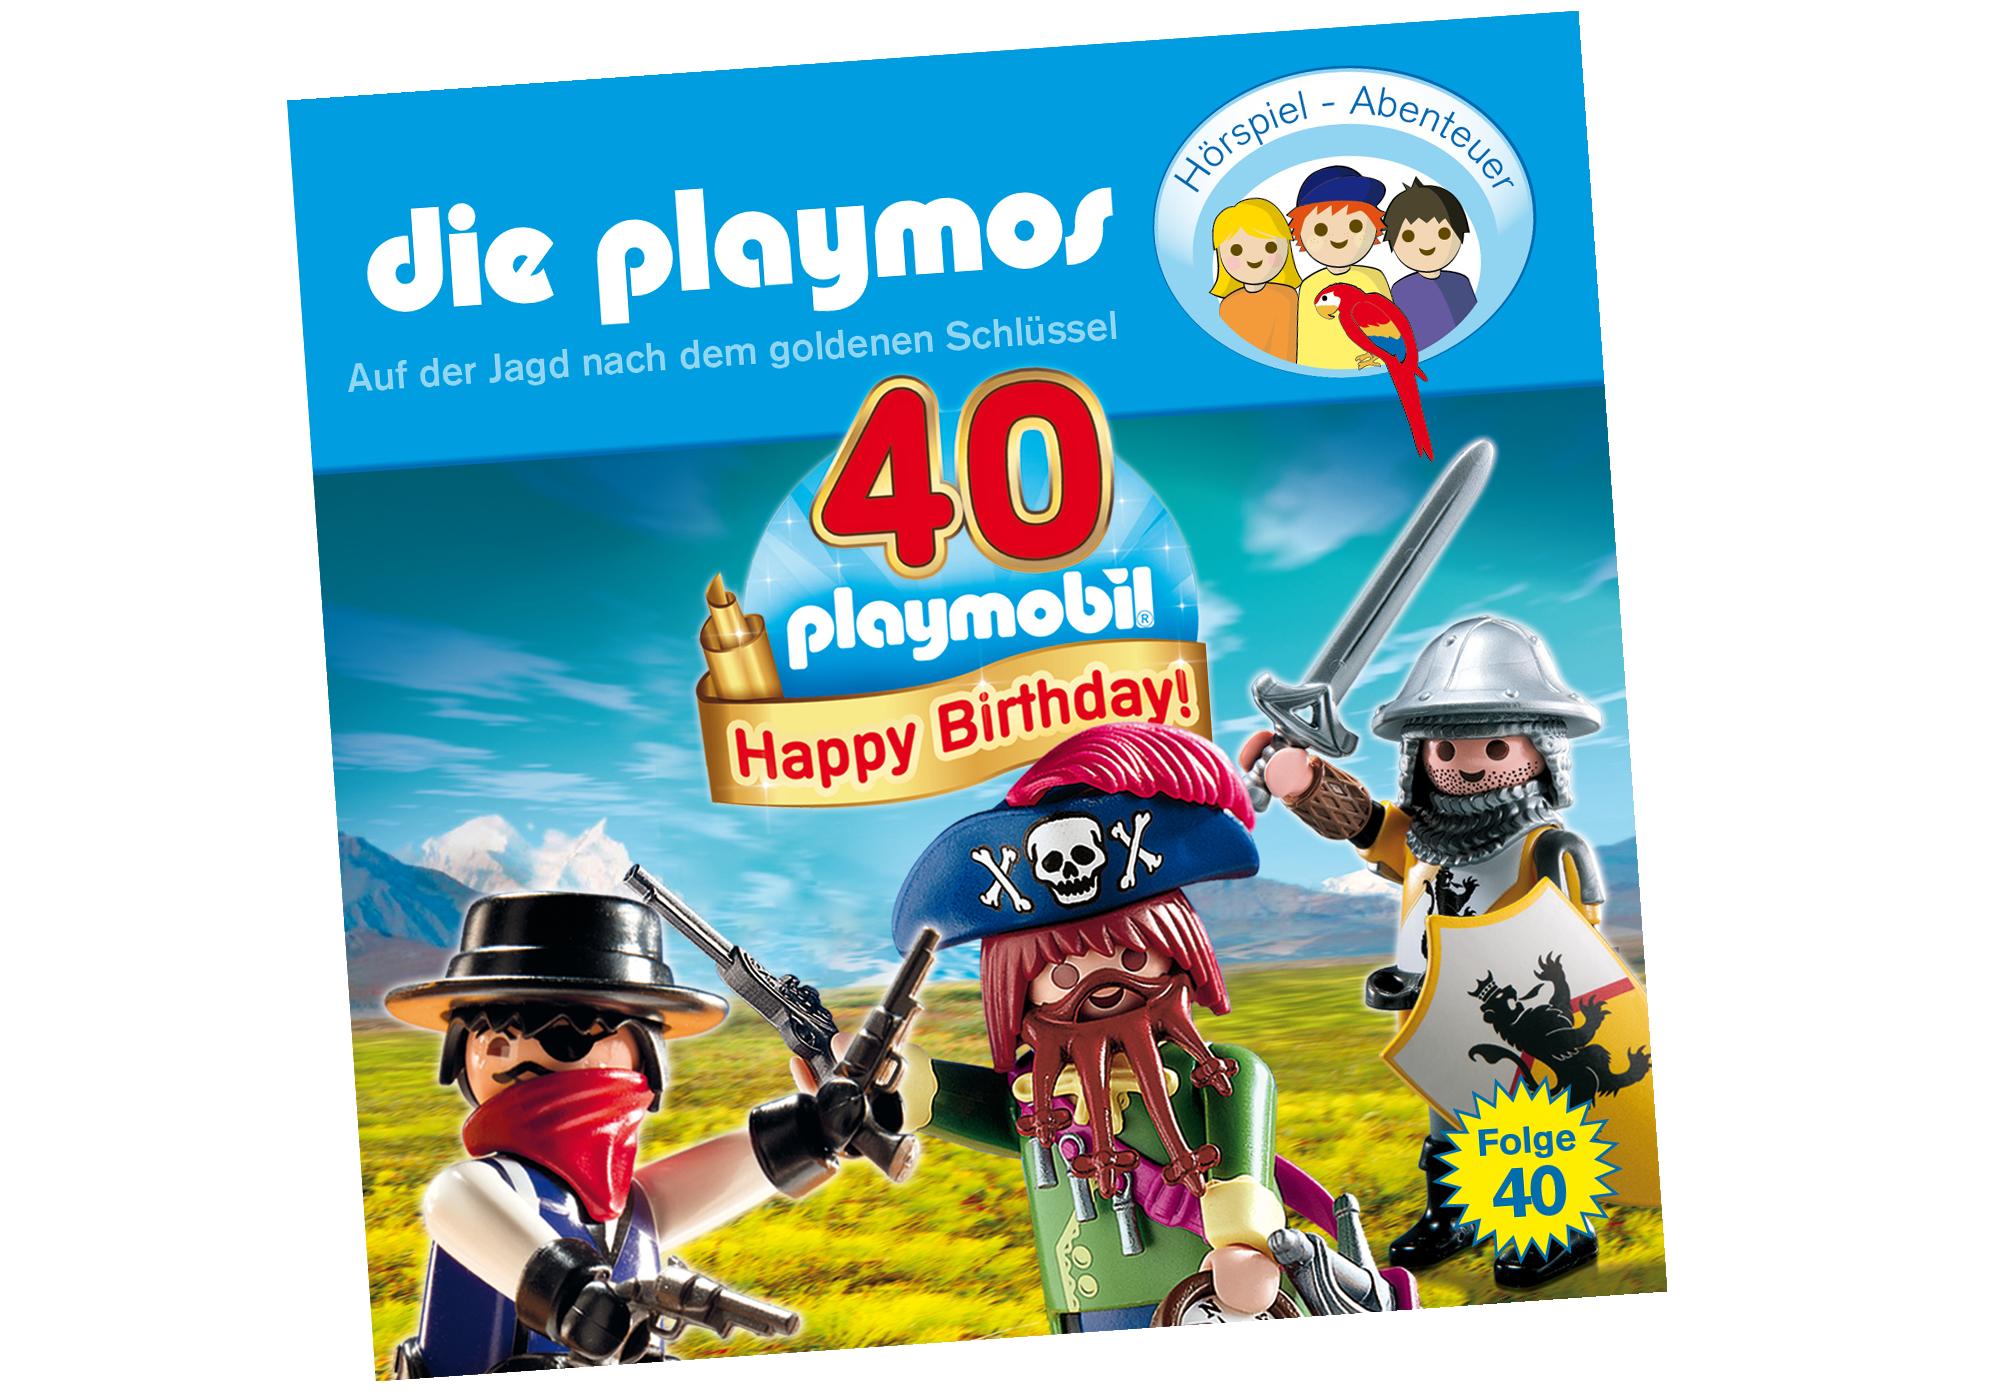 http://media.playmobil.com/i/playmobil/80453_product_detail